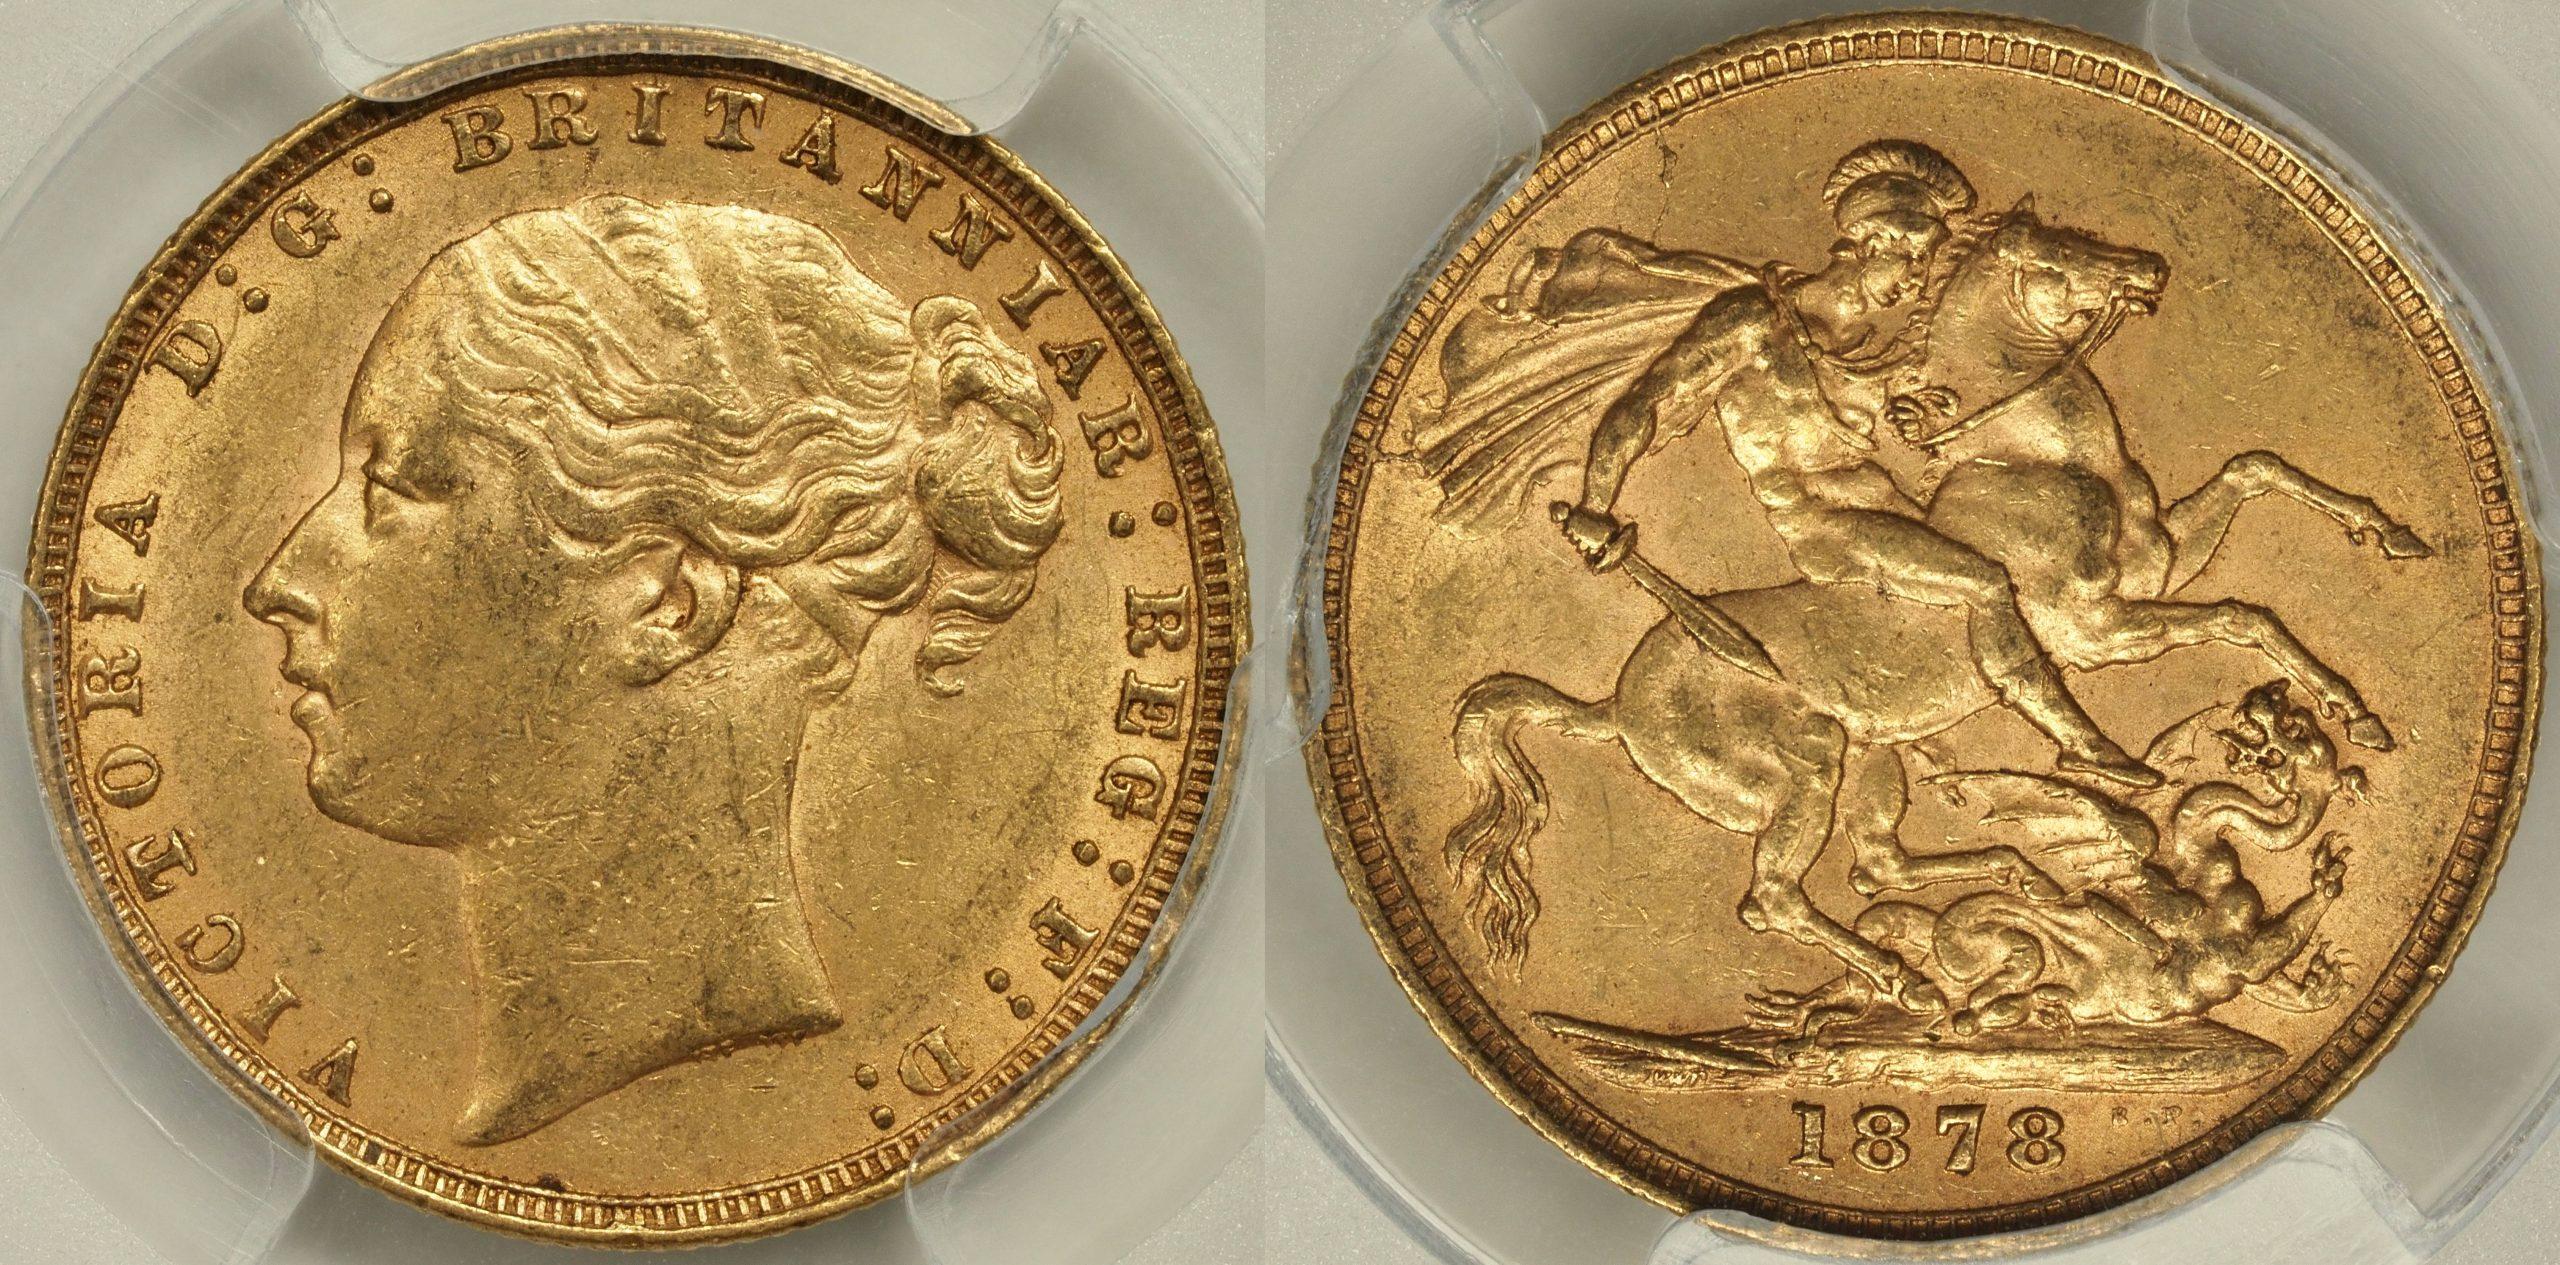 Great Britain 1878 Sovereign - PCGS AU58